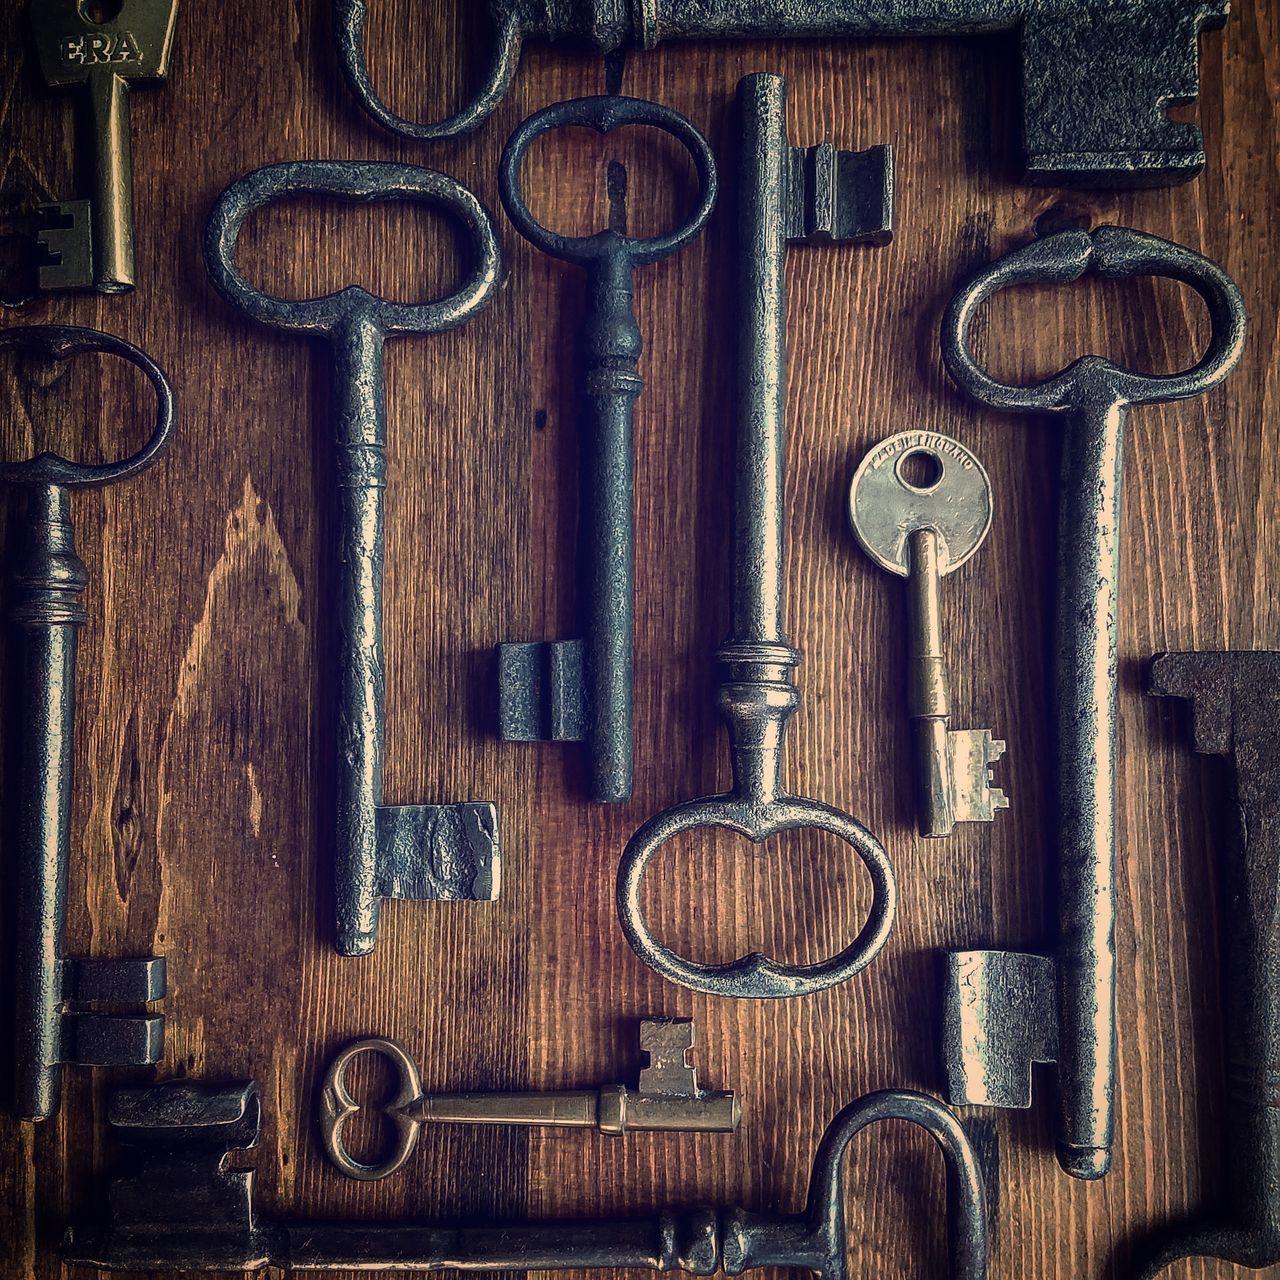 Skeleton Key  Variation Large Group Of Objects Indoors  No People Close-up Day Antiquecollection Antique Key Antique Keys Old Keys French Antique Keys Photography Keys Eyem Diversity